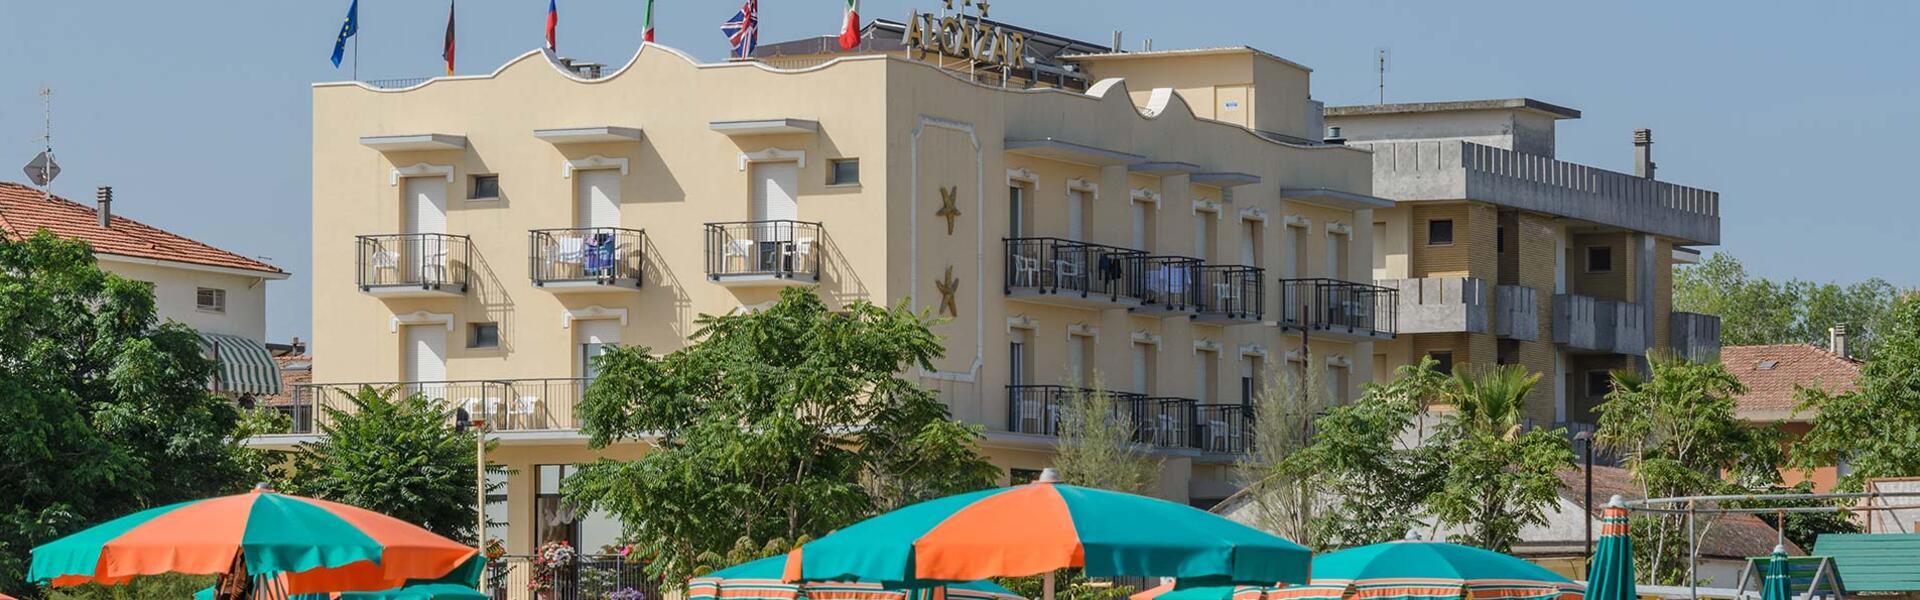 hotelalcazarimini it home 003